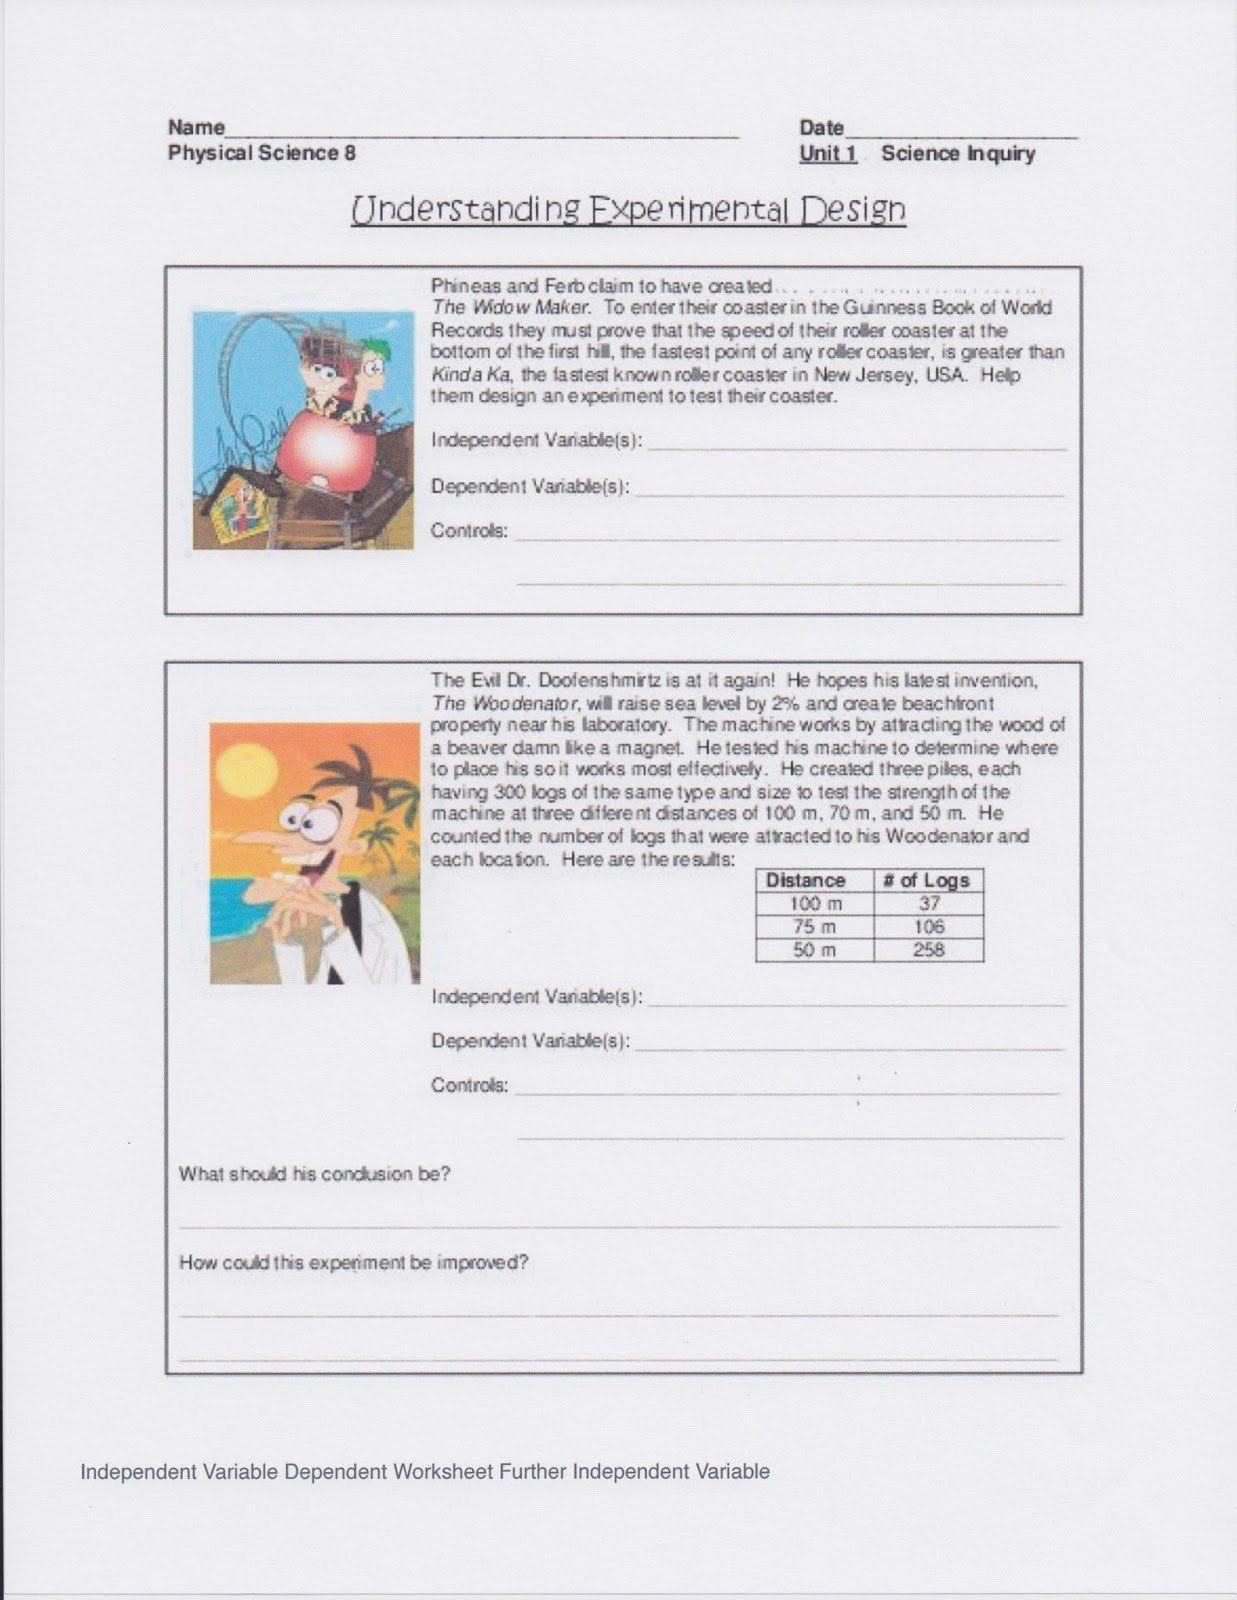 Experimental Design Practice Worksheet Dr Gayden S Chemistry Class Kids Worksheets Printables Letter Worksheets For Preschool Scientific Method Worksheet Free